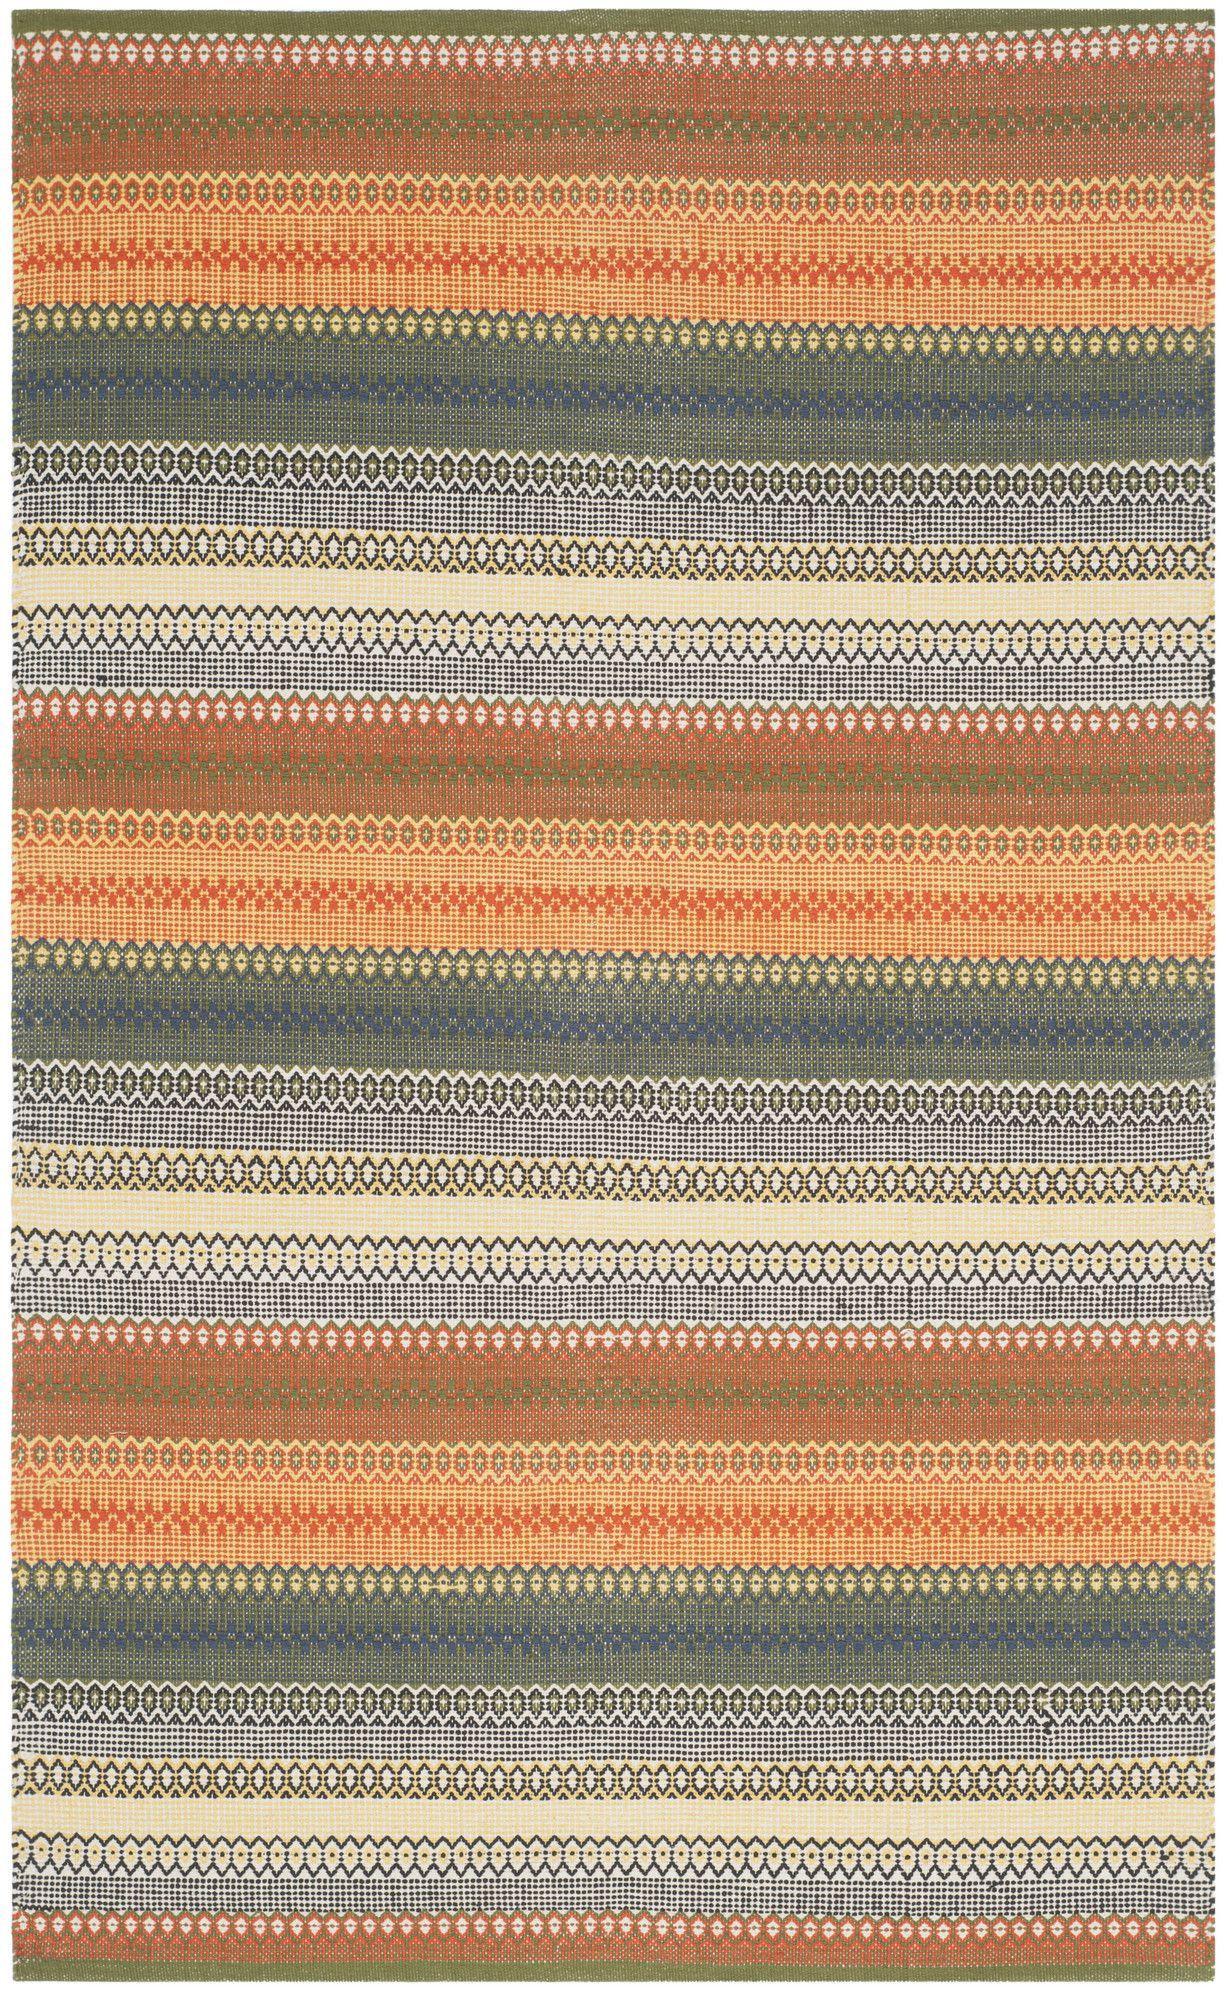 Chiginagak Handwoven Flatweave Gold Gray Area Rug Striped Rug Striped Kilim Kilim Area Rug